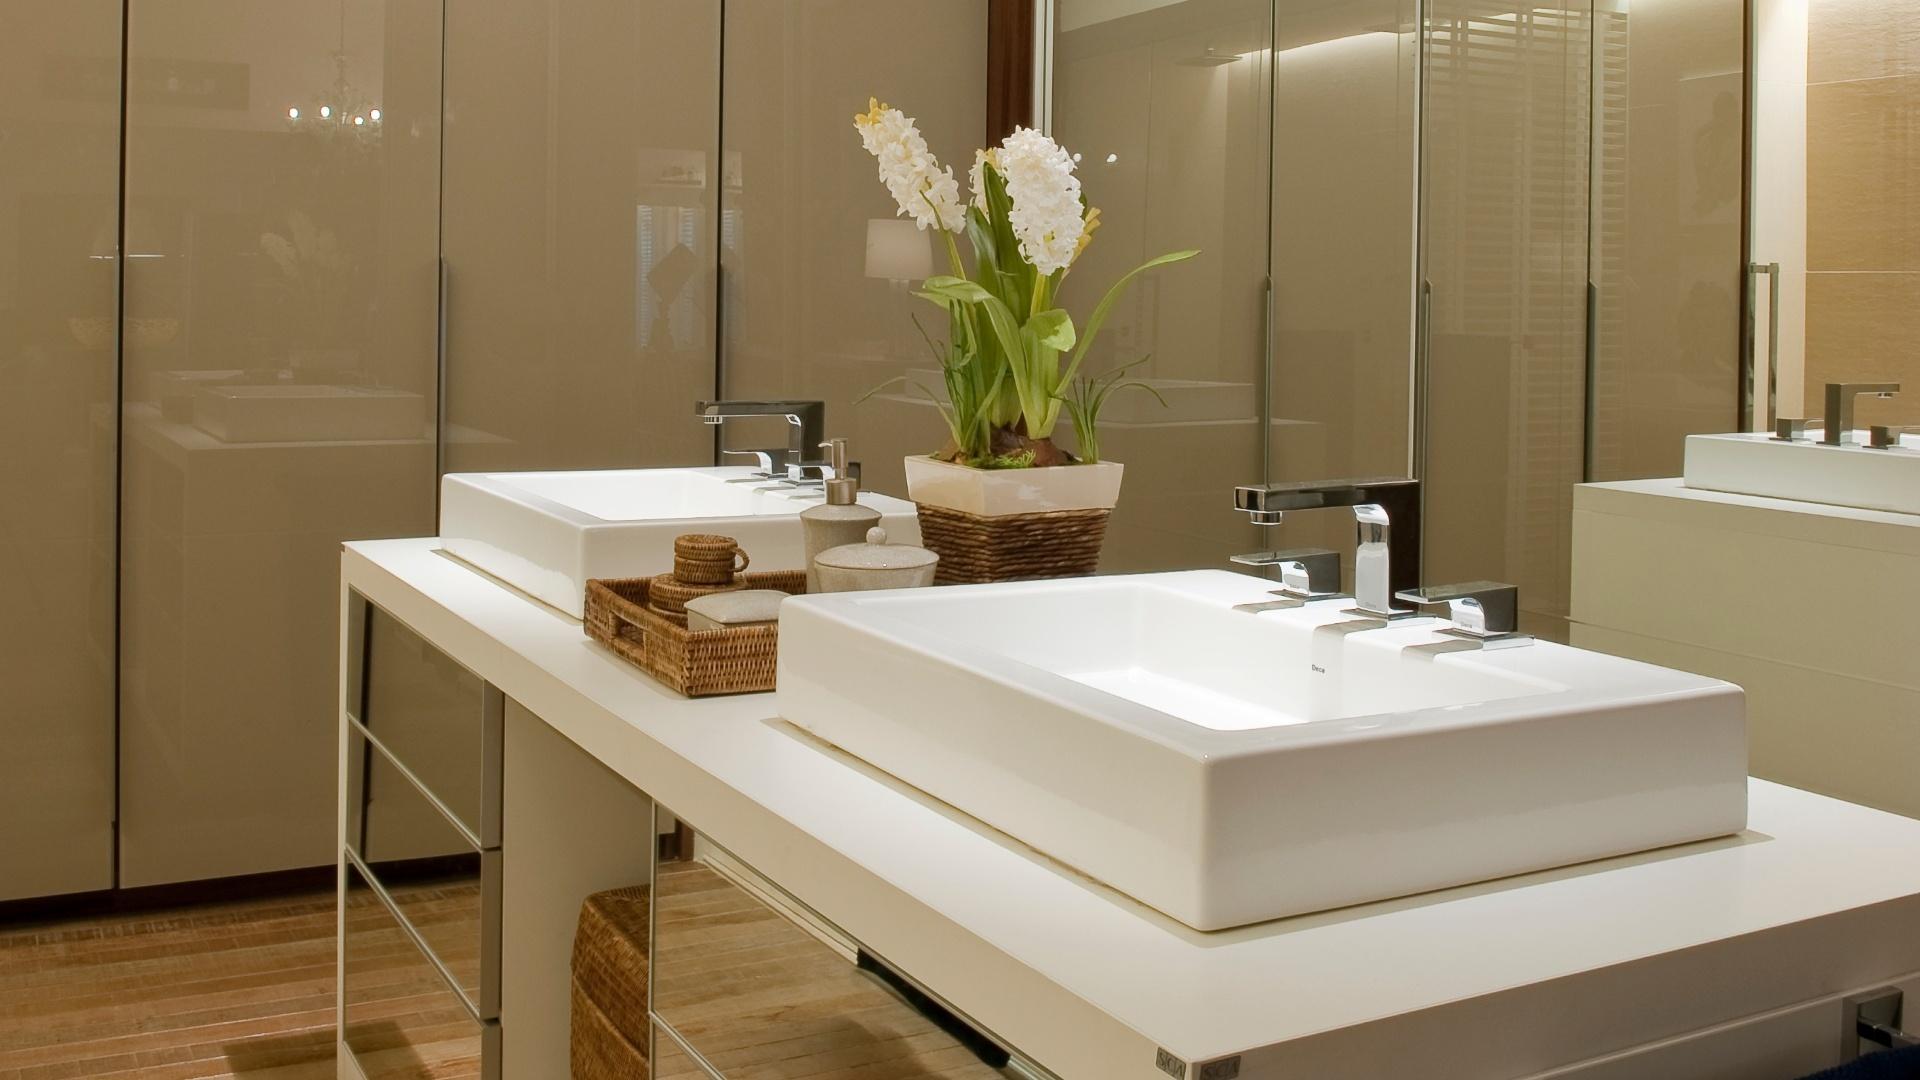 #51590B closet banheiros modernos confira os modelos modelos de portas para  1920x1080 px Banheiros Pequenos Pisos 195